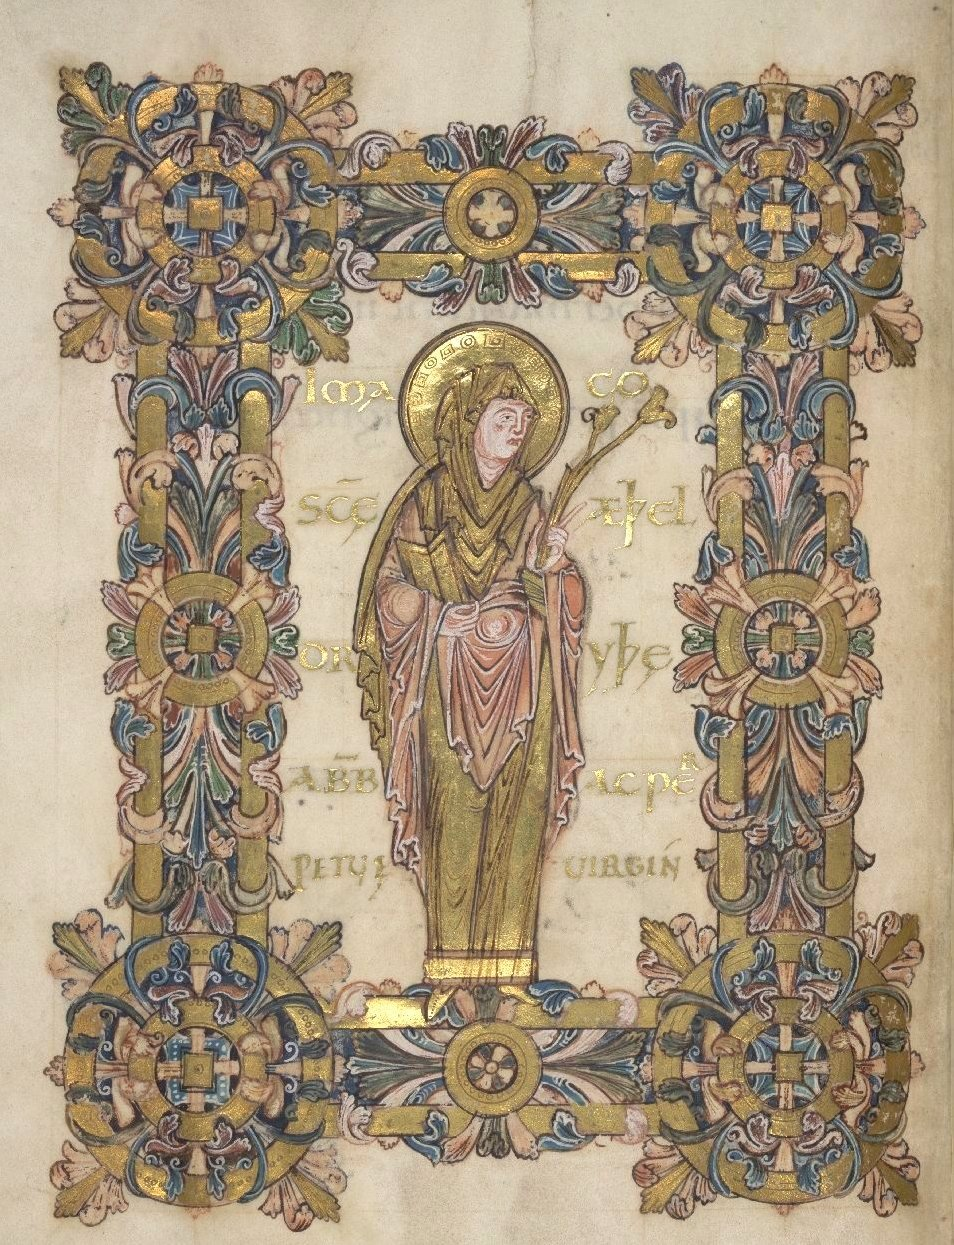 Aethelthryth of Ely